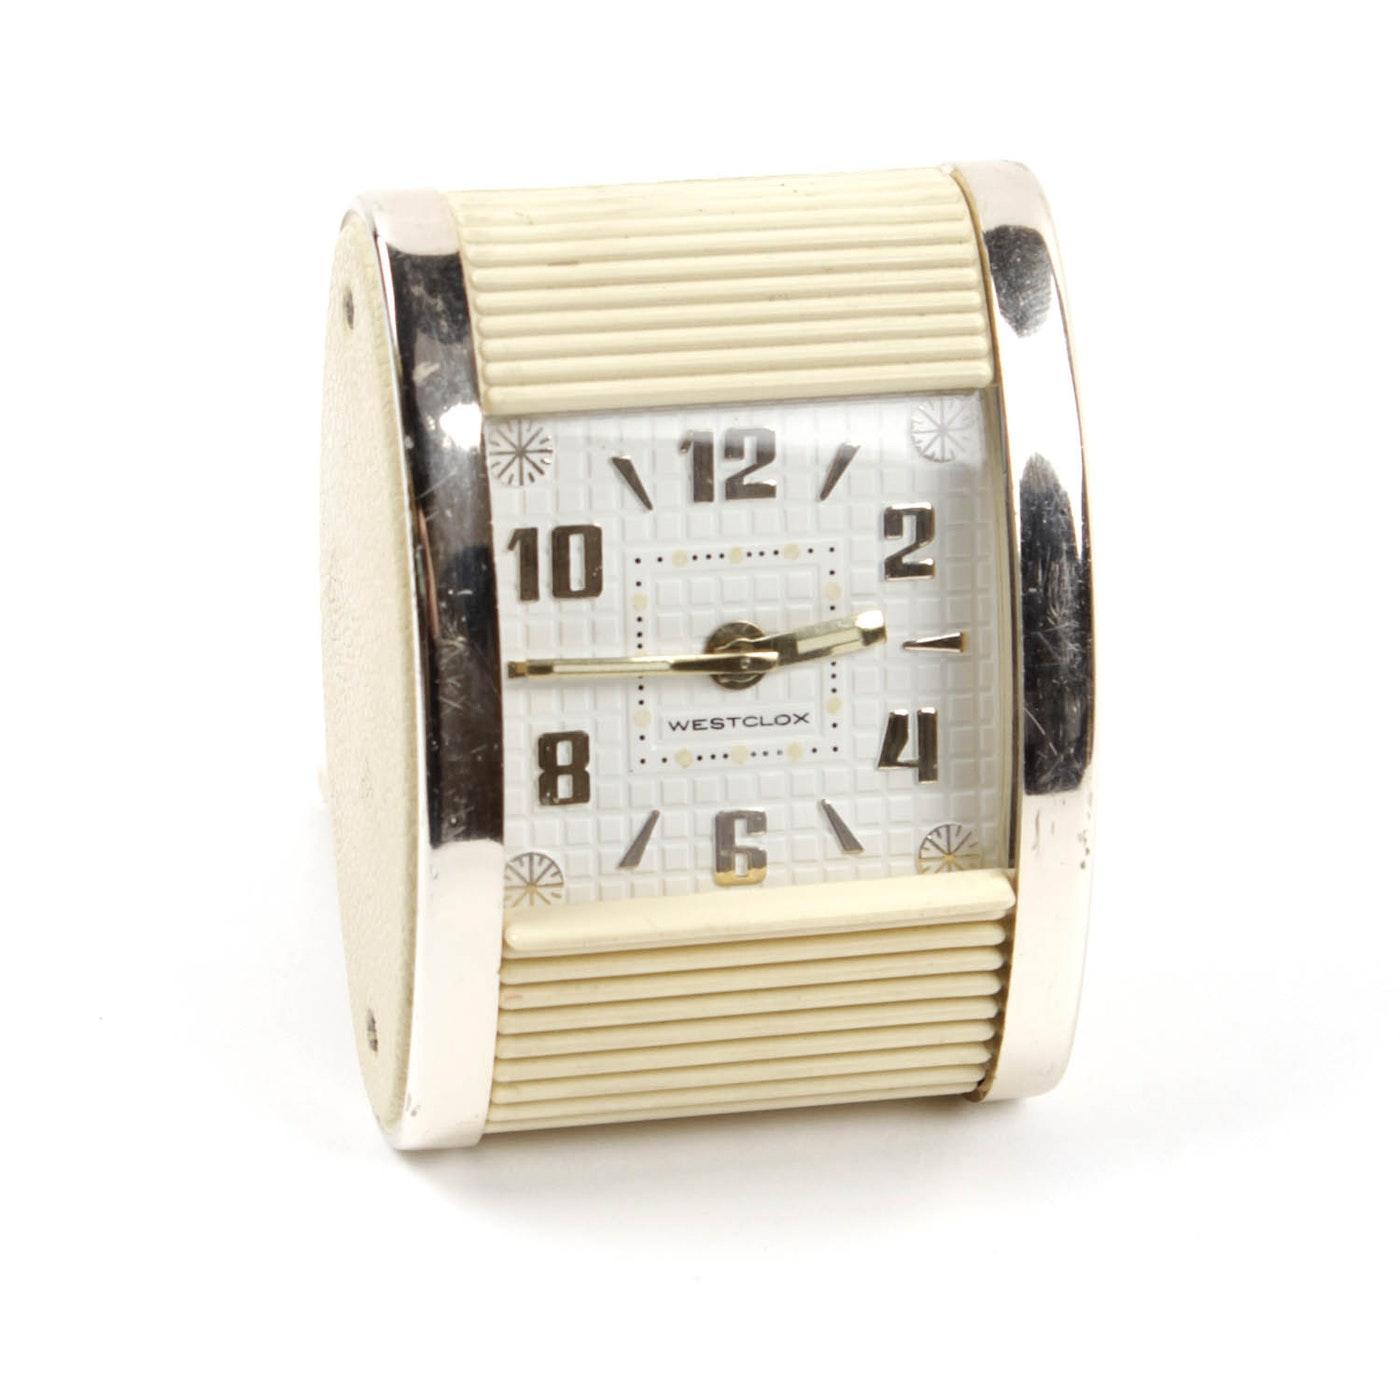 1950s mid century modern westclox roll top travel alarm for Best alarm clock 2016